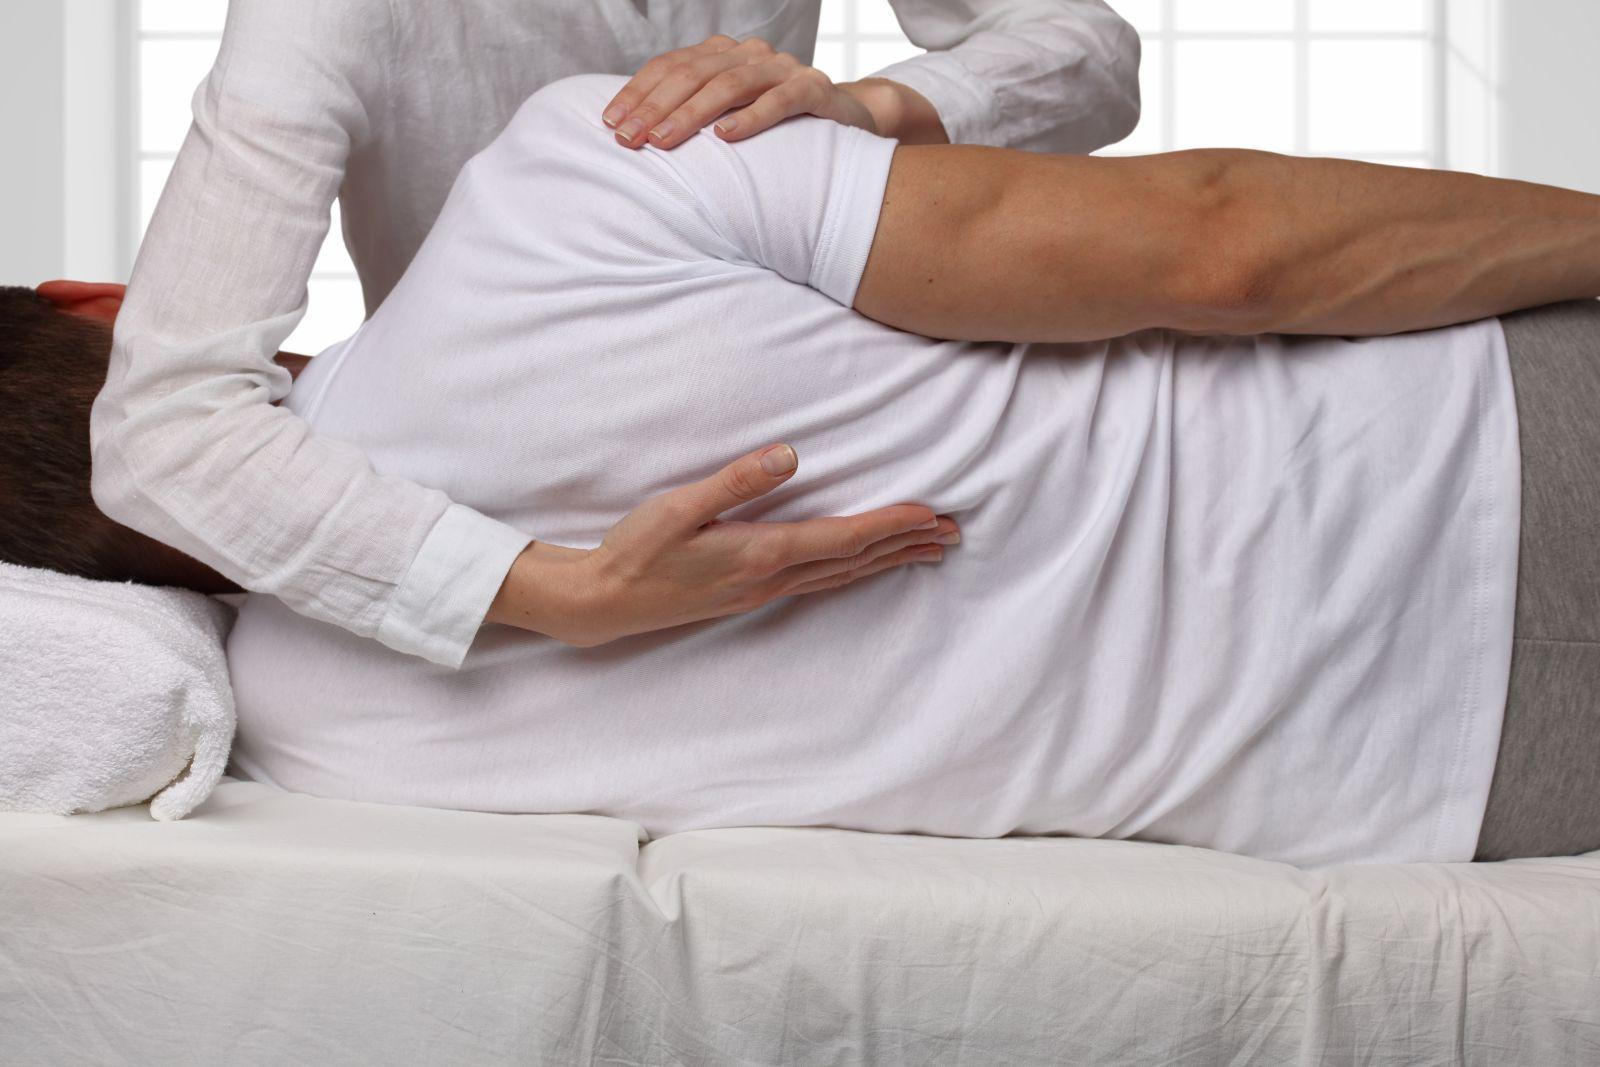 Dr. Beau massaging someone's lower back